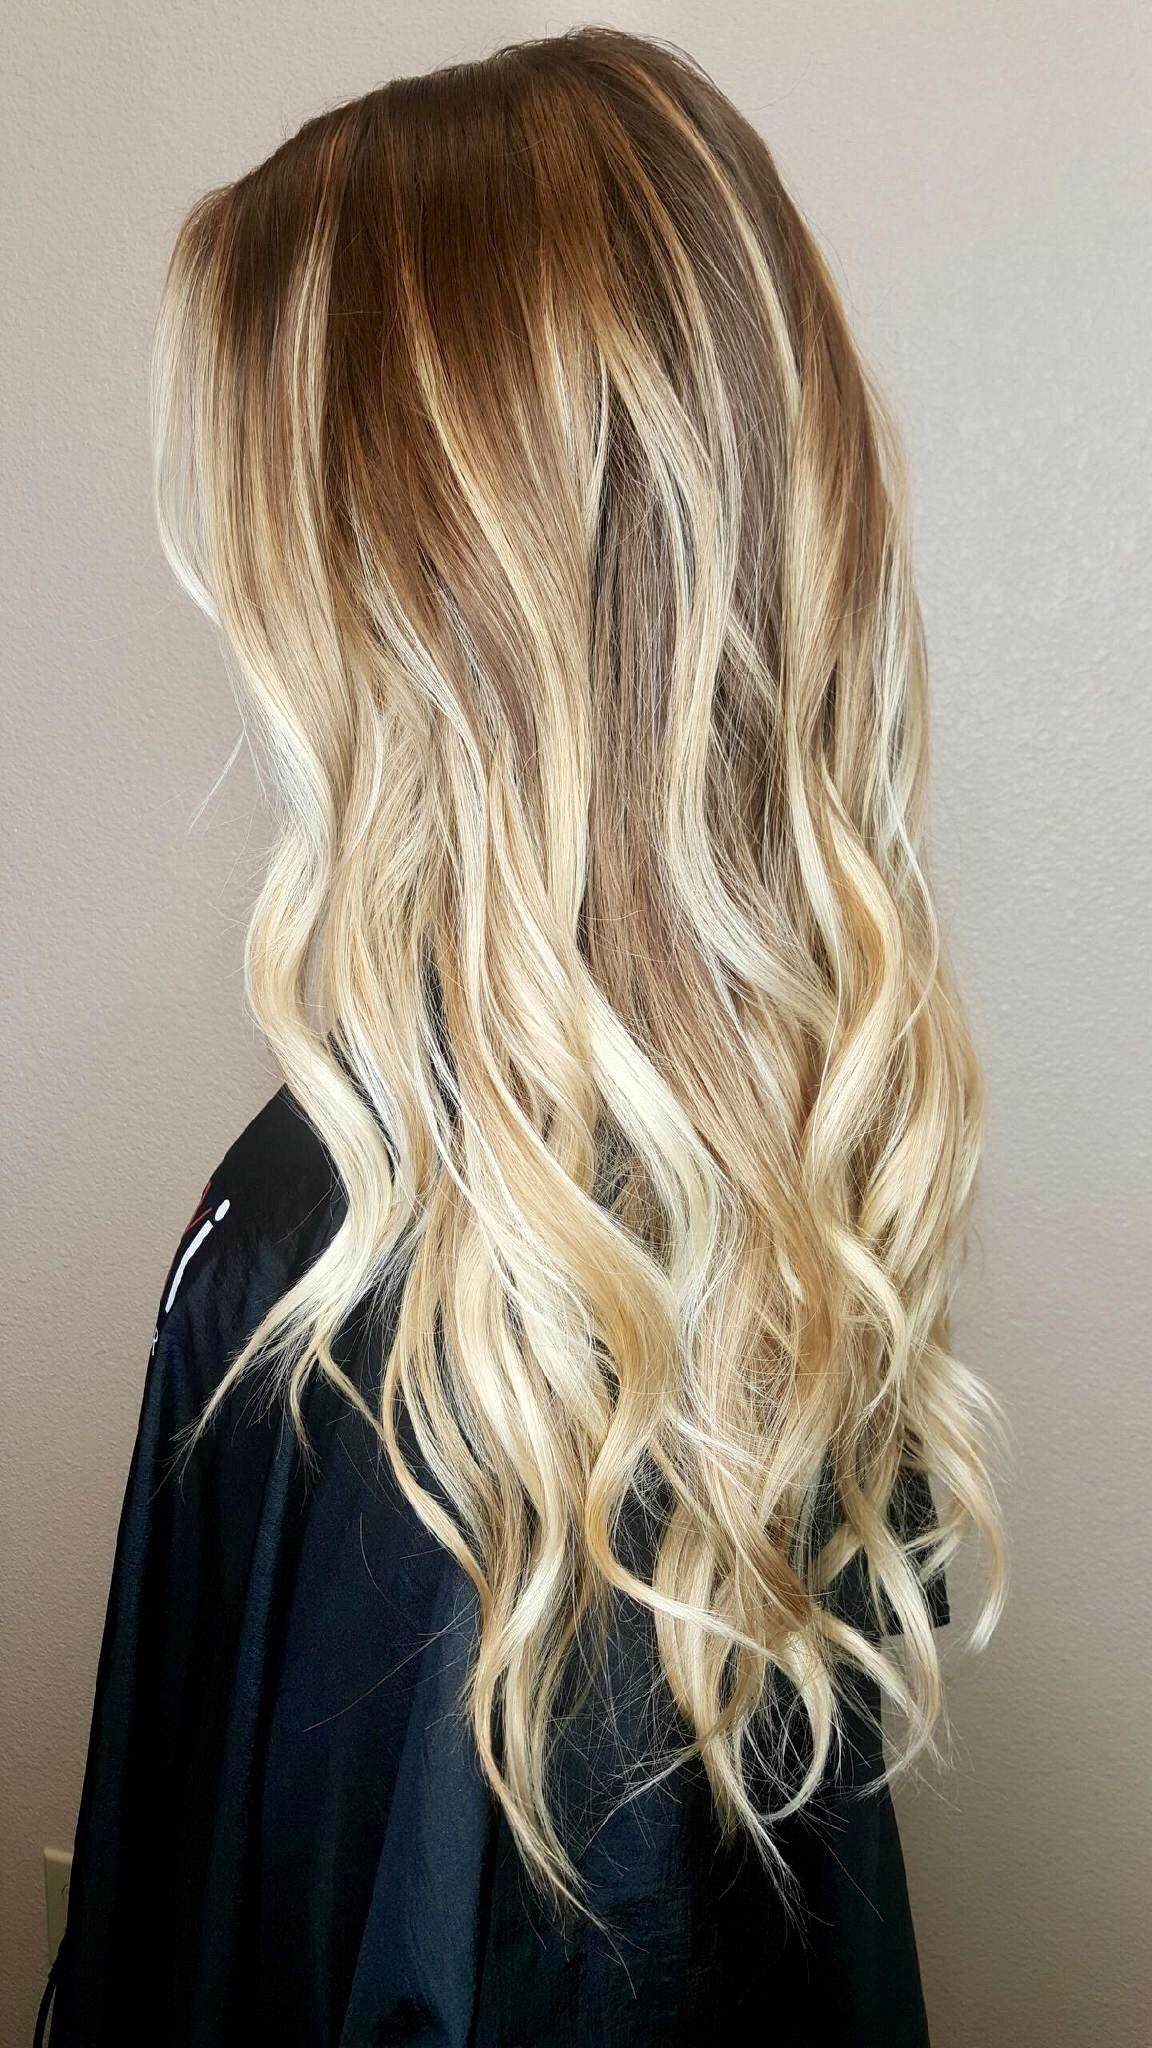 Blonde Balayage By Amber Rose Honeycomb Studio Blonde